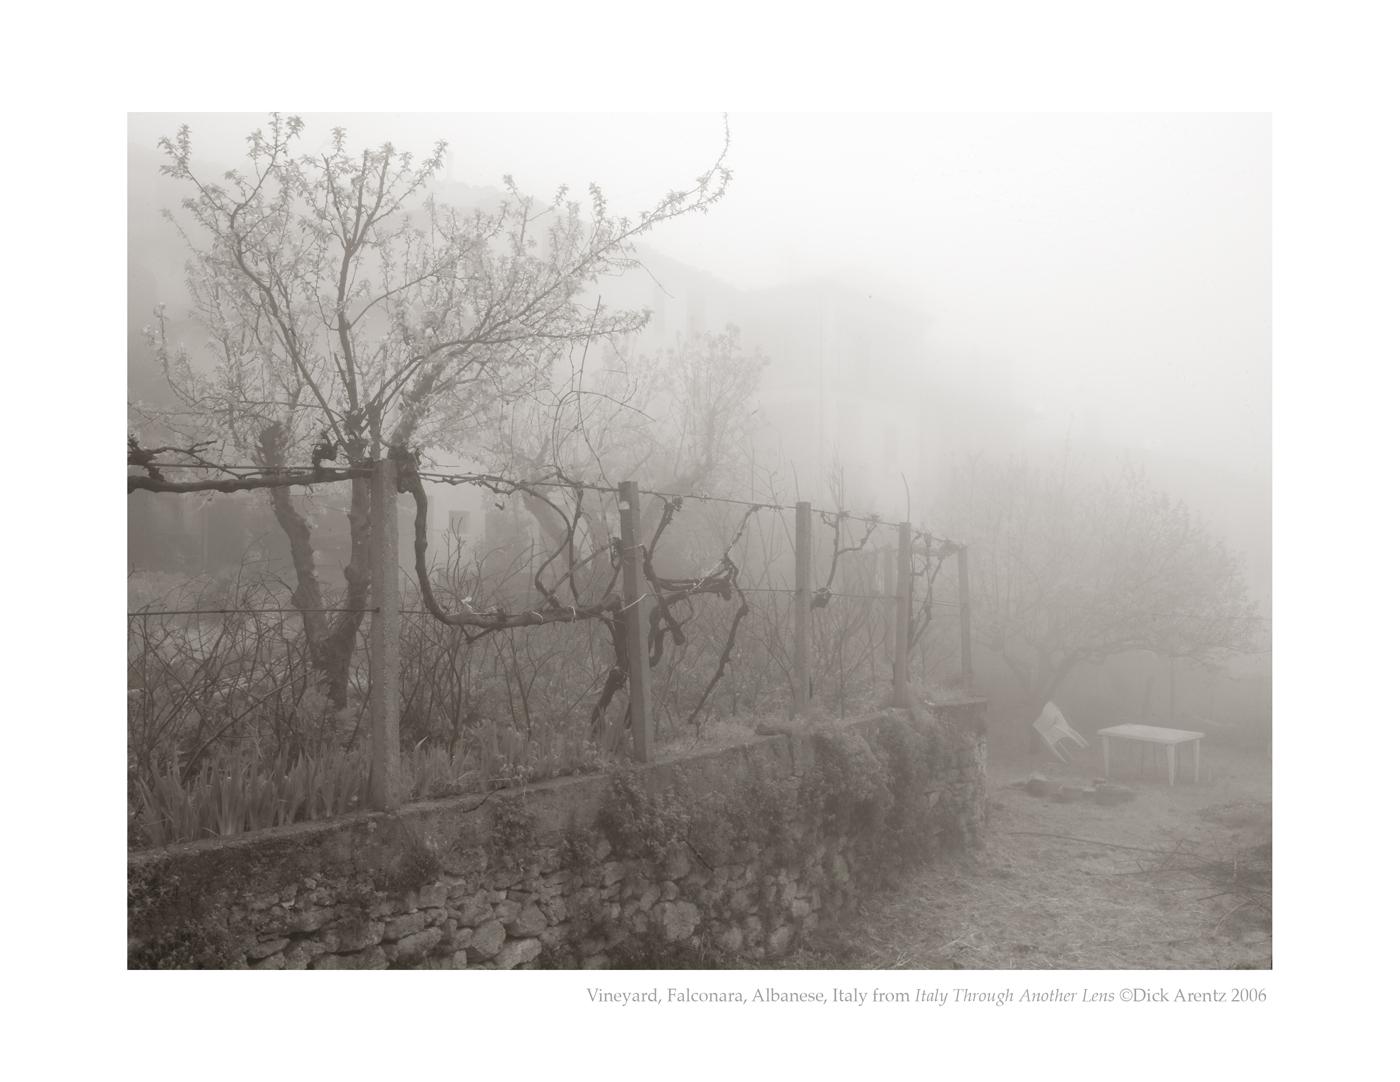 Vineyard, Falconara, Albanese, Italy - Italy Through Another Lens